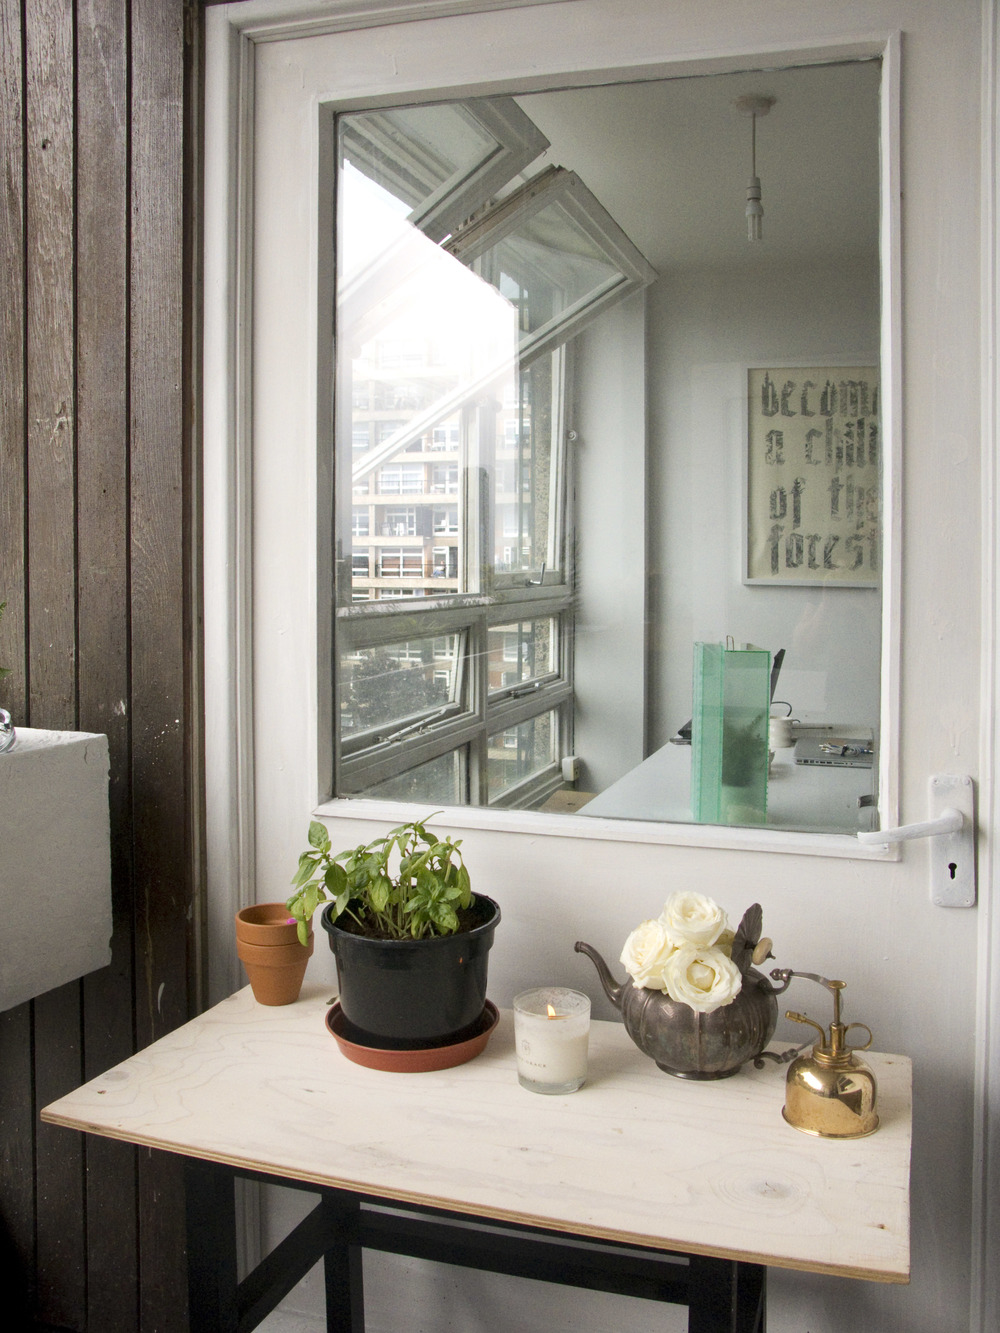 Balcony_Balfron Box